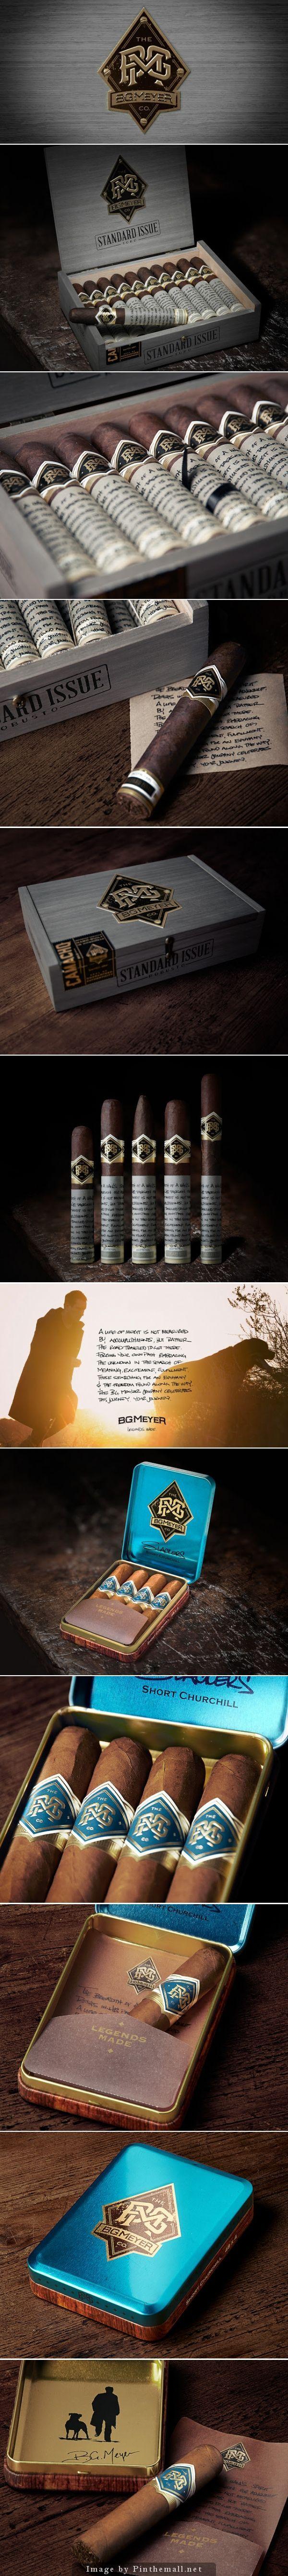 BG Myers cigars great flavor